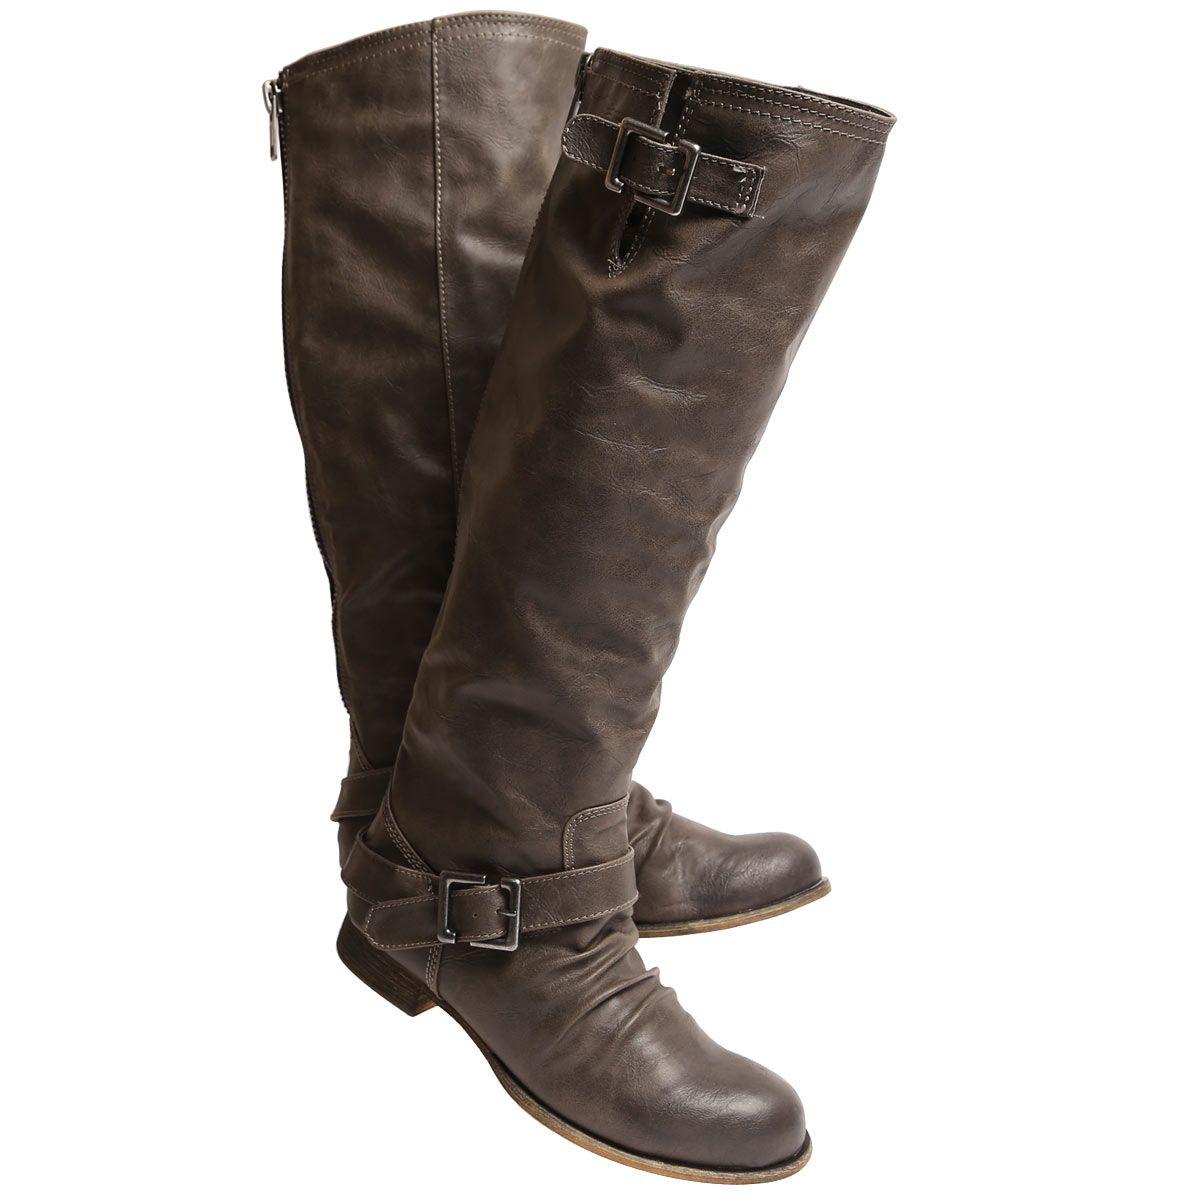 SoftMoc Women's BRENNA grey tall riding boots brenna gry   All I ...